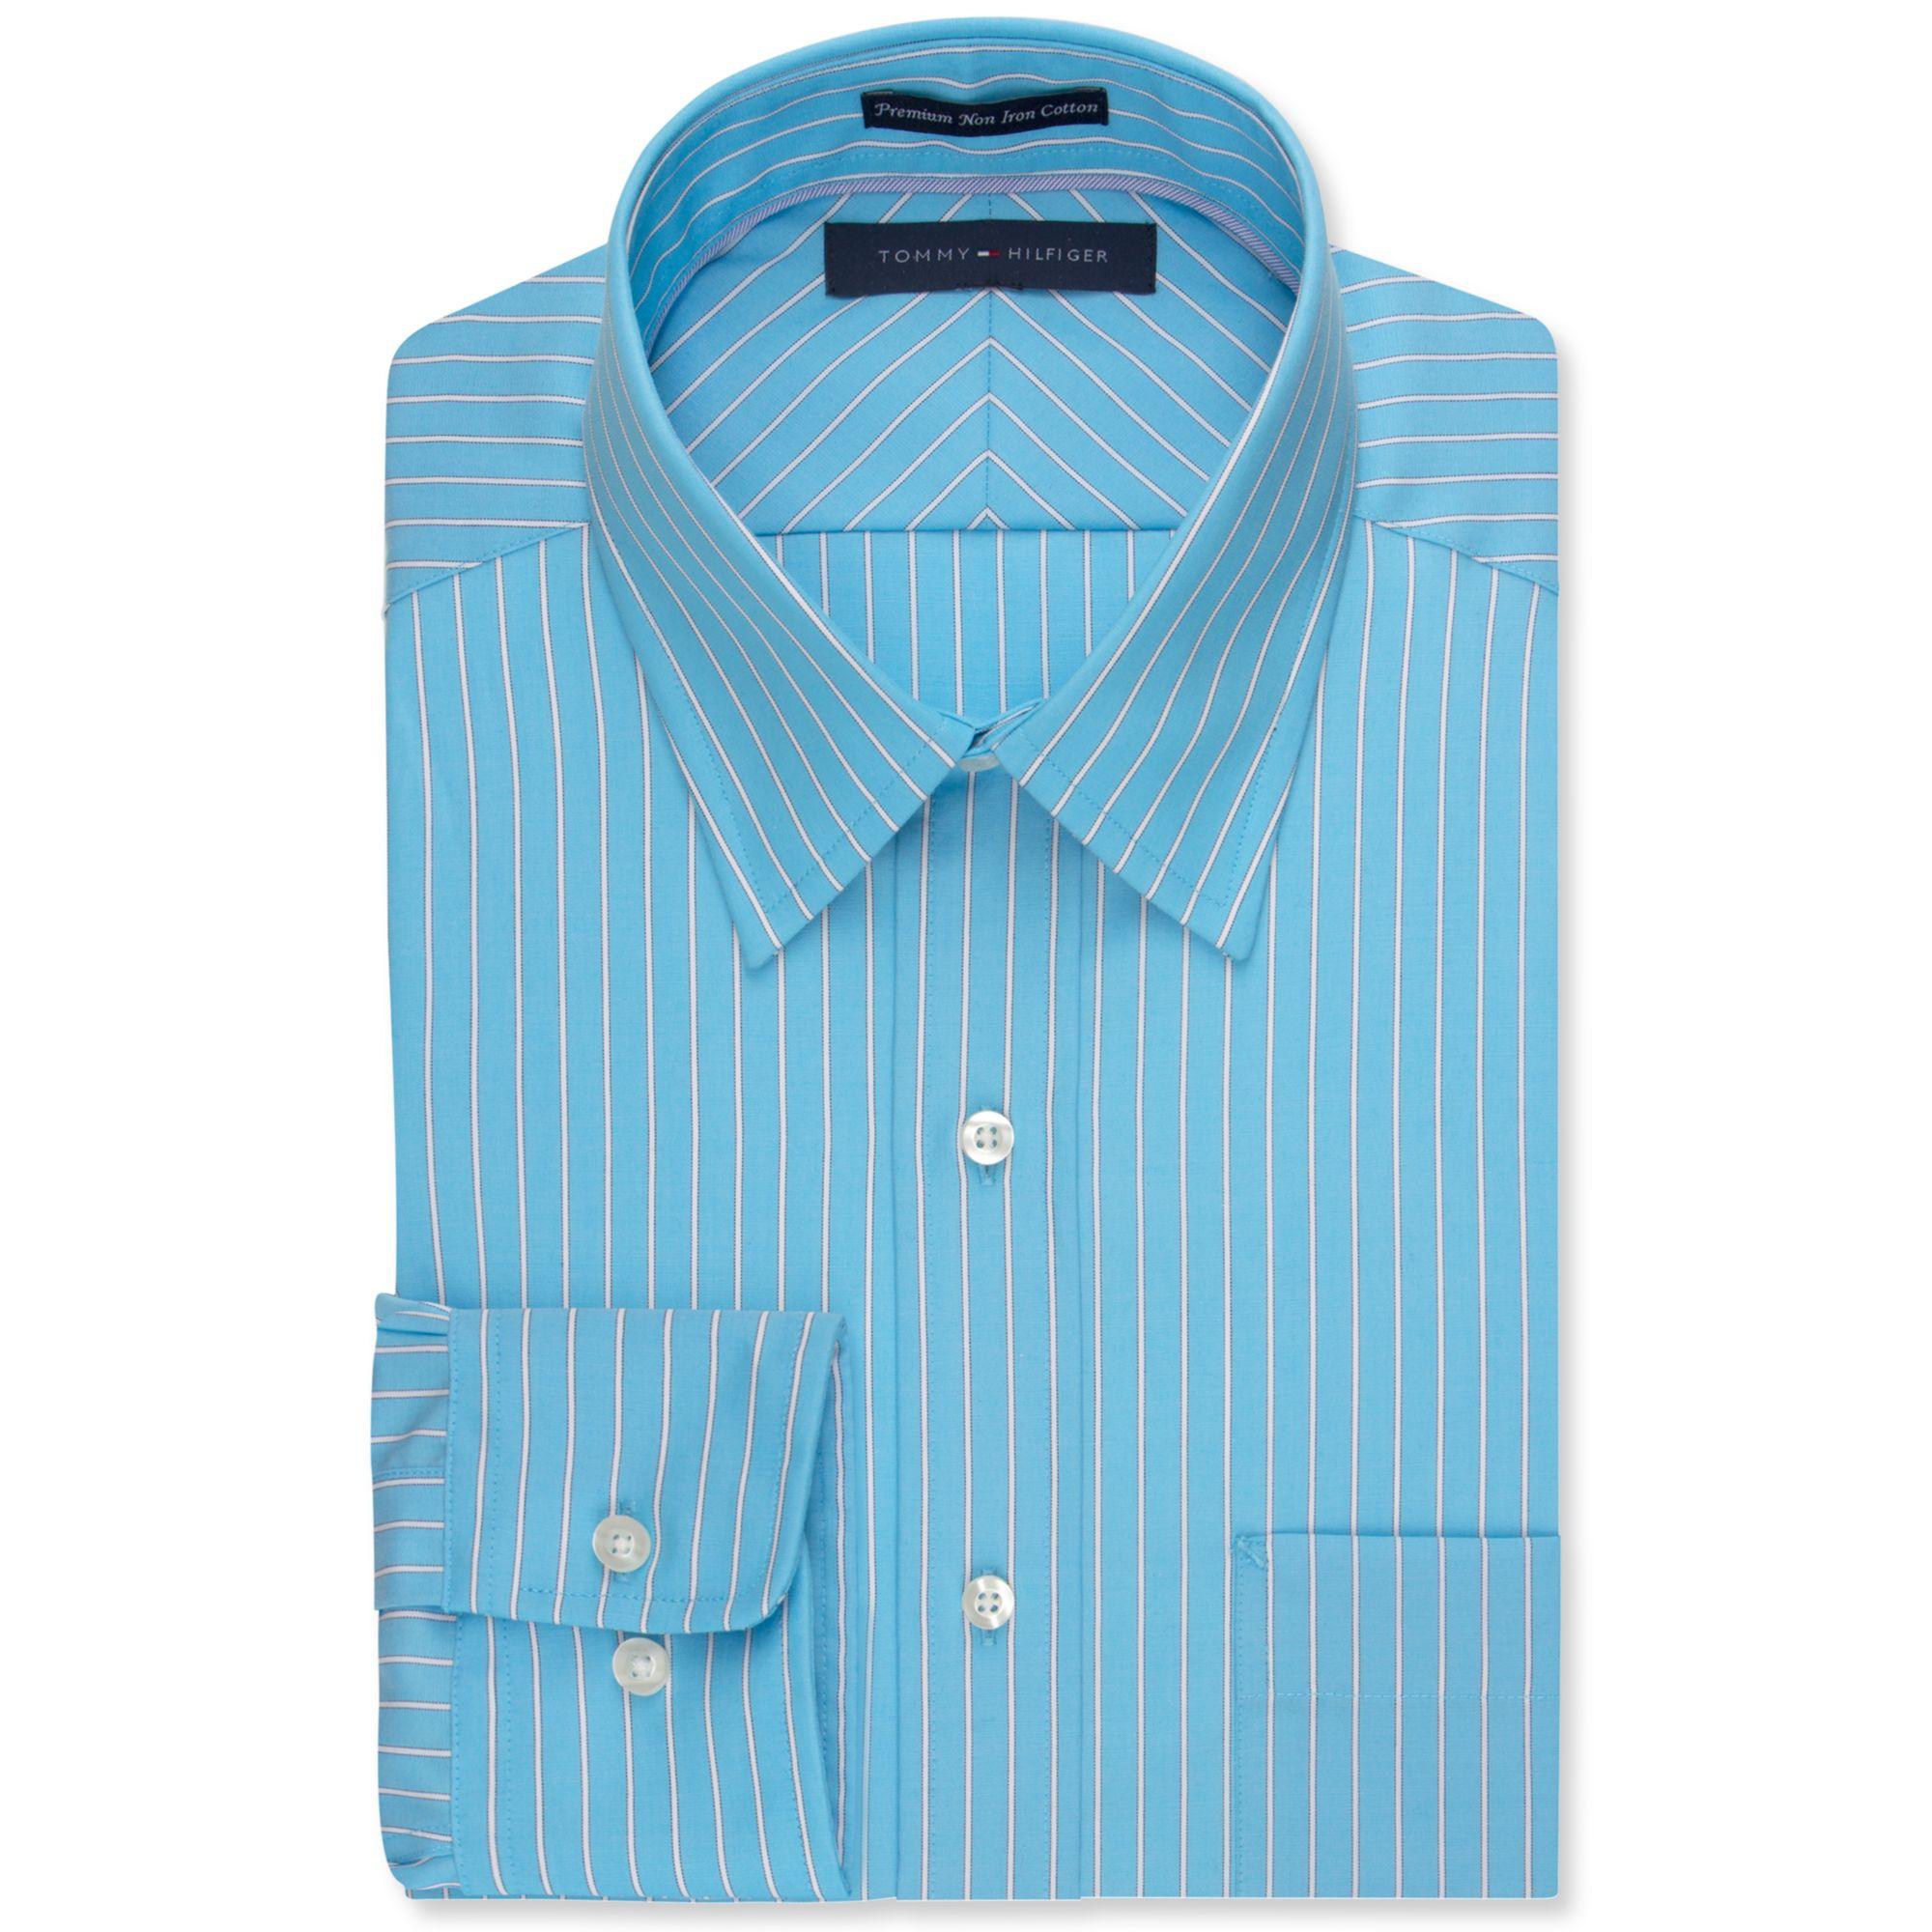 Tommy Hilfiger No Iron Aqua And White Stripe Dress Shirt